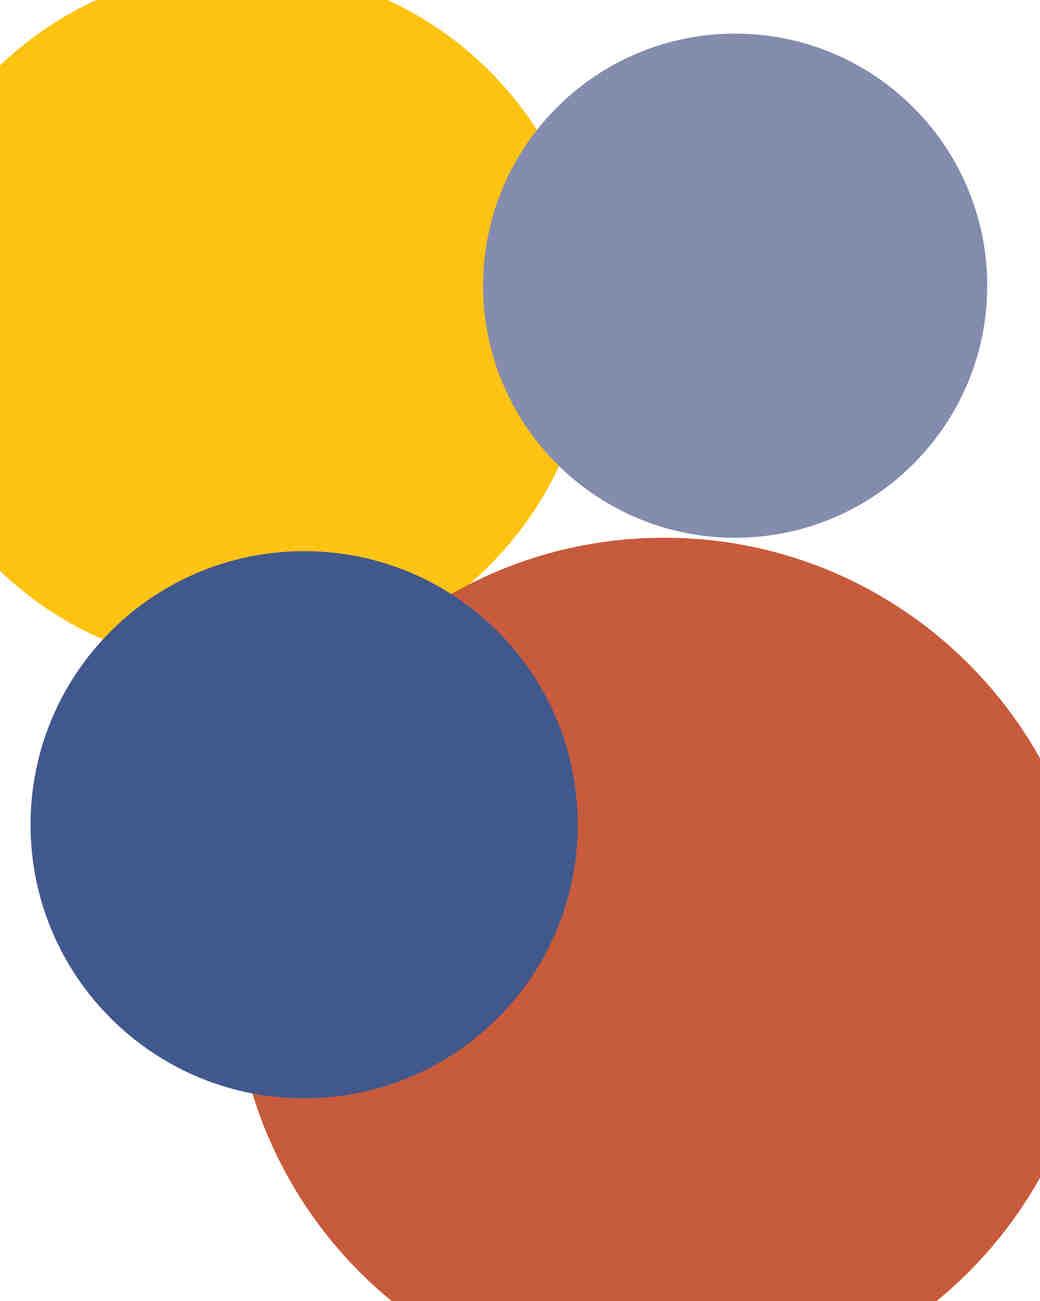 fall-wedding-colors-persimmon-gold-blue-0915.jpg